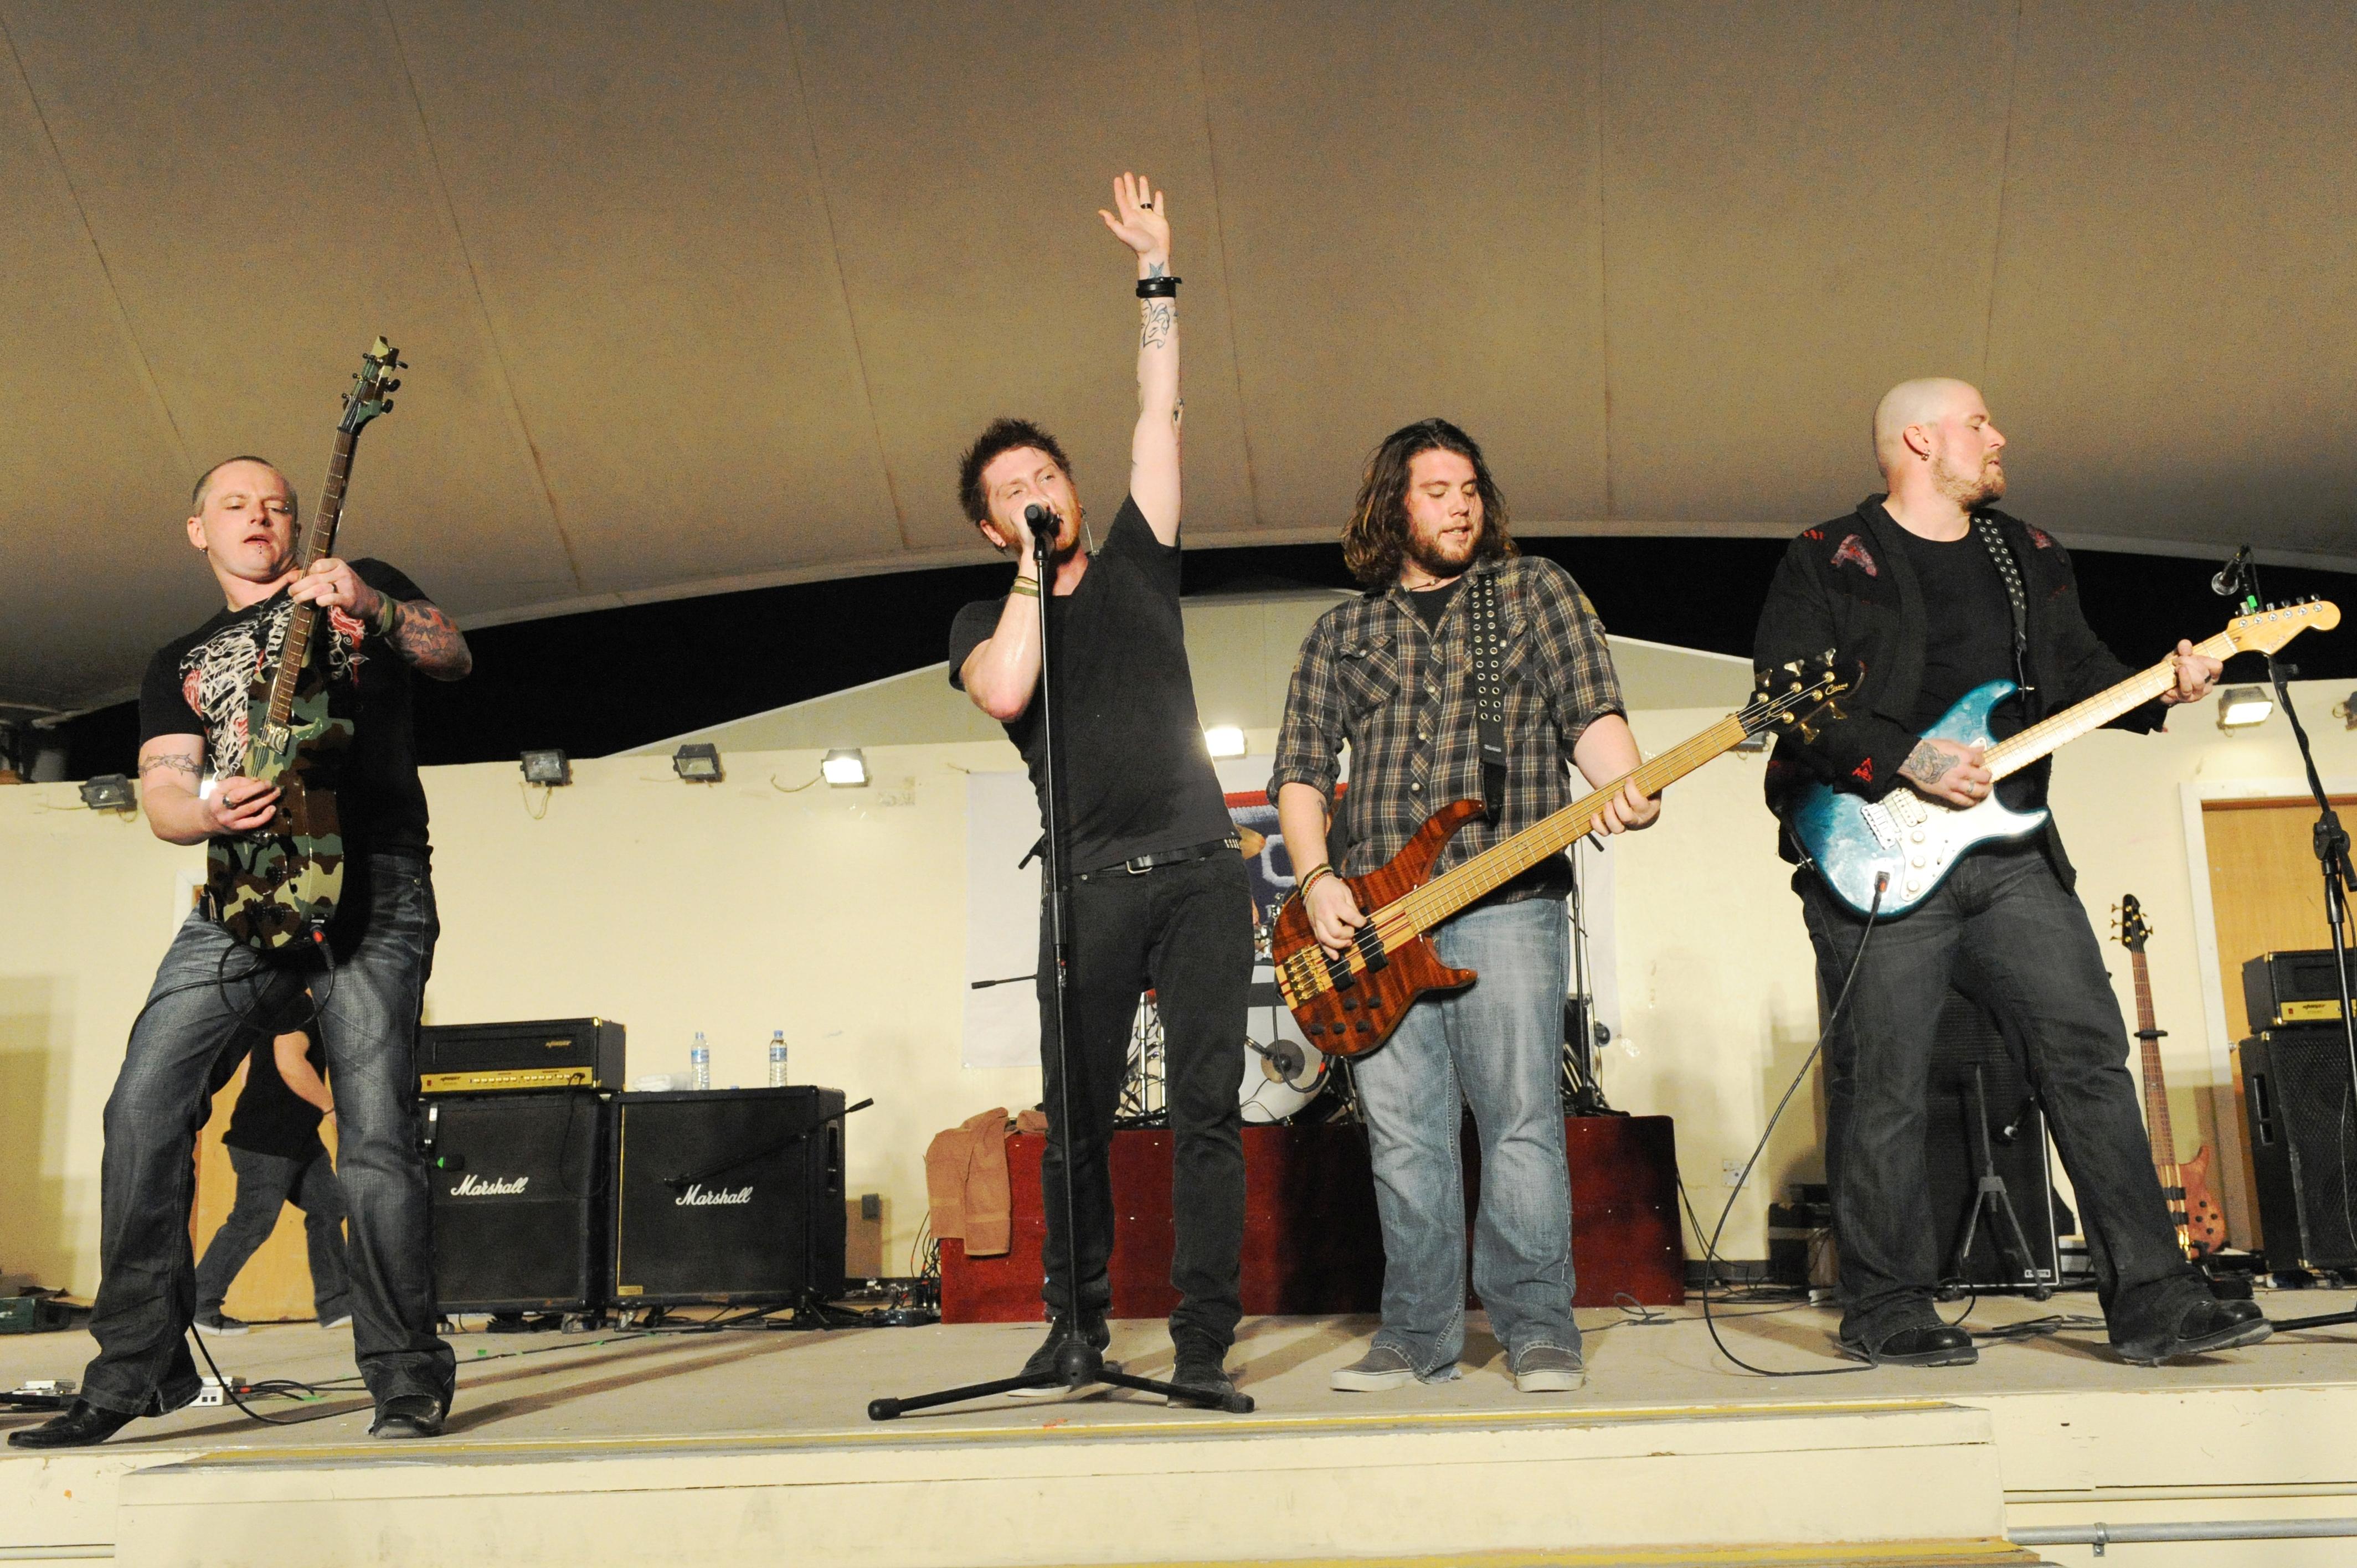 U.S. Air Force Band Rock Group, The - Mach 1